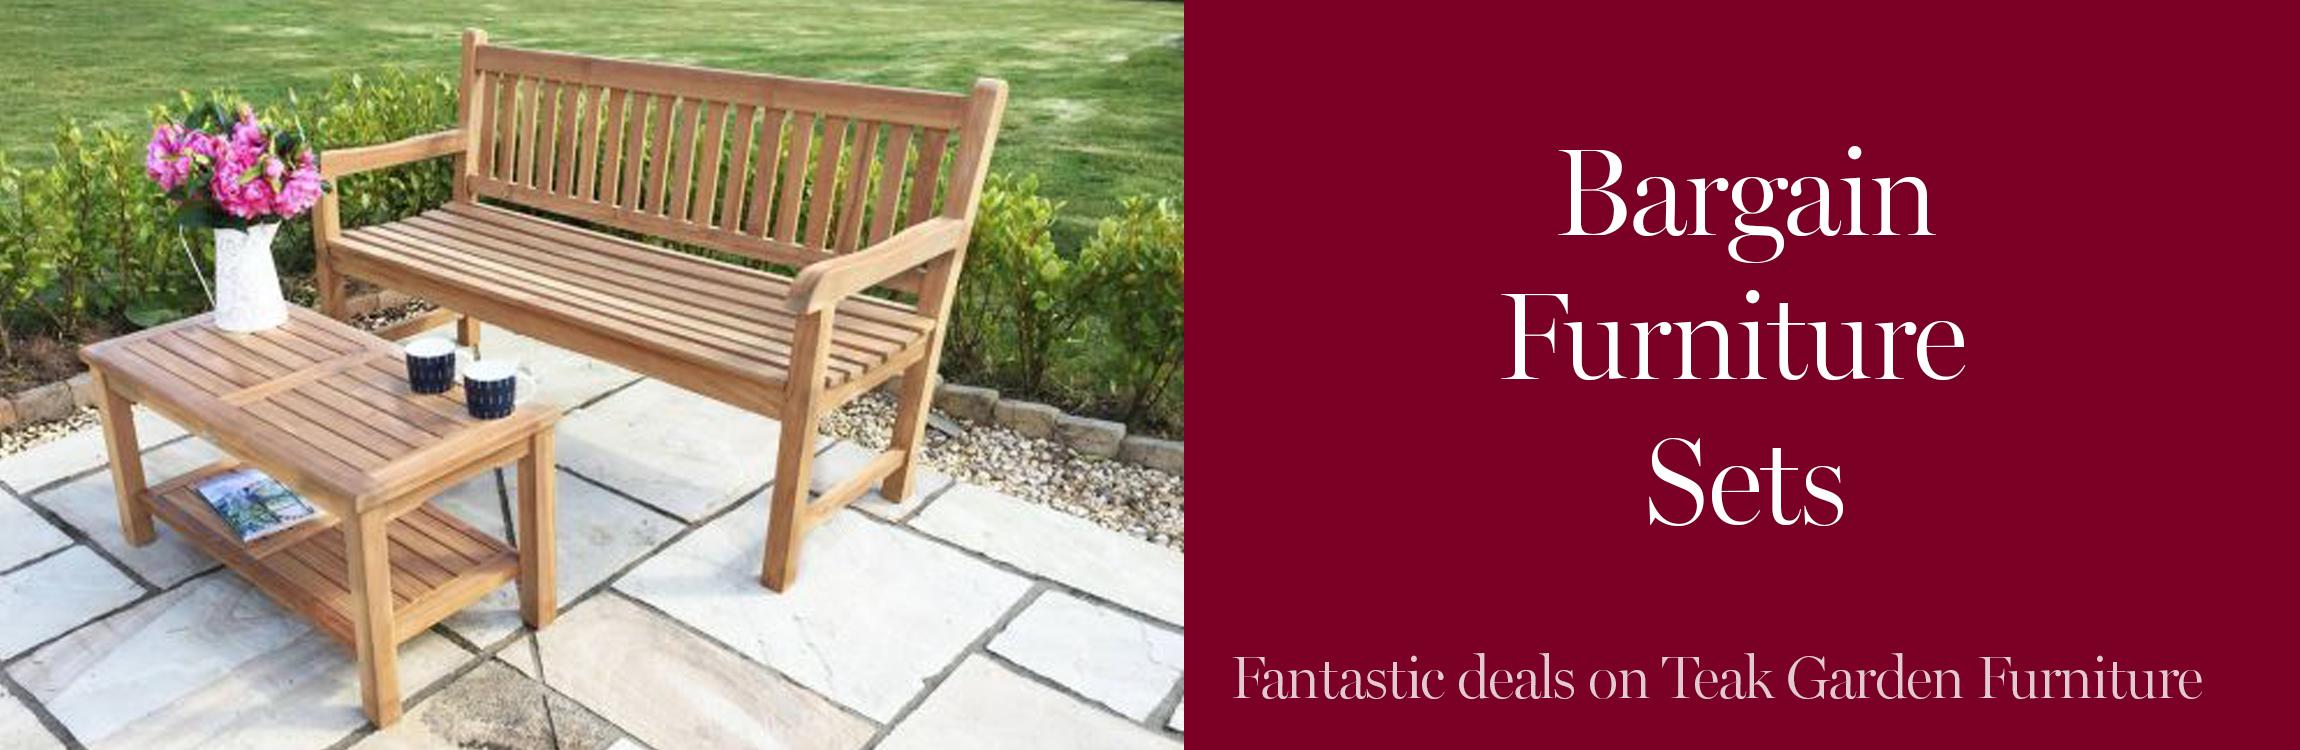 Bargain Garden Furniture Sets